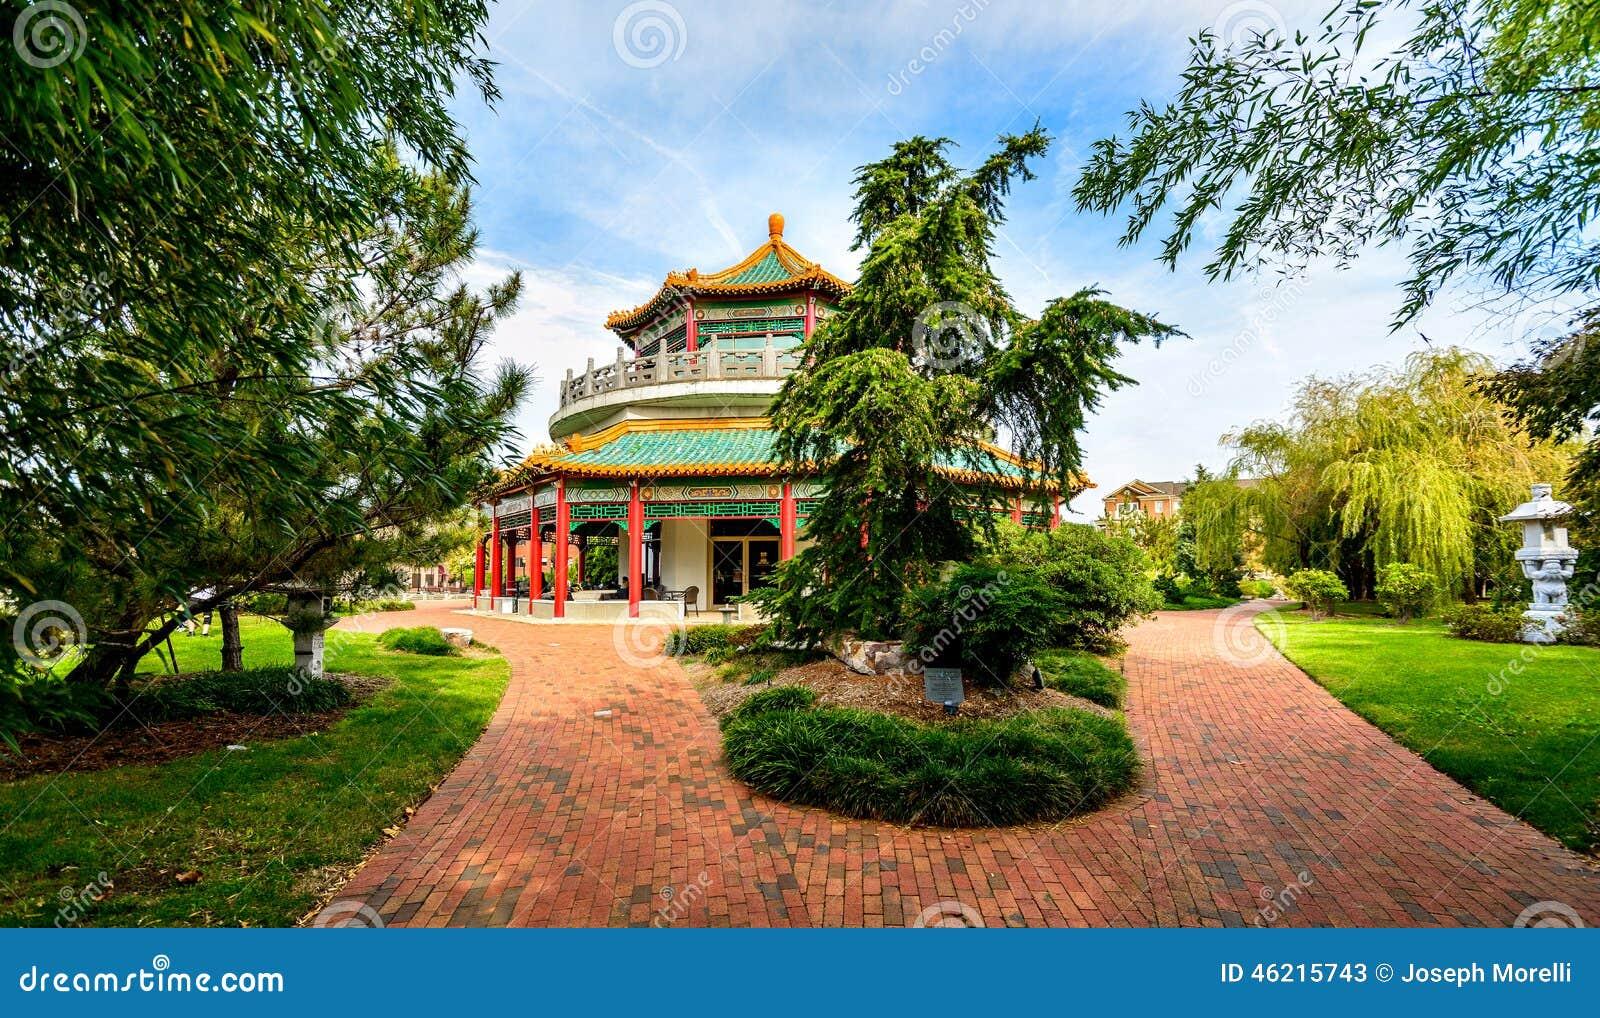 Oriental Gardens And Pagoda Stock Photo